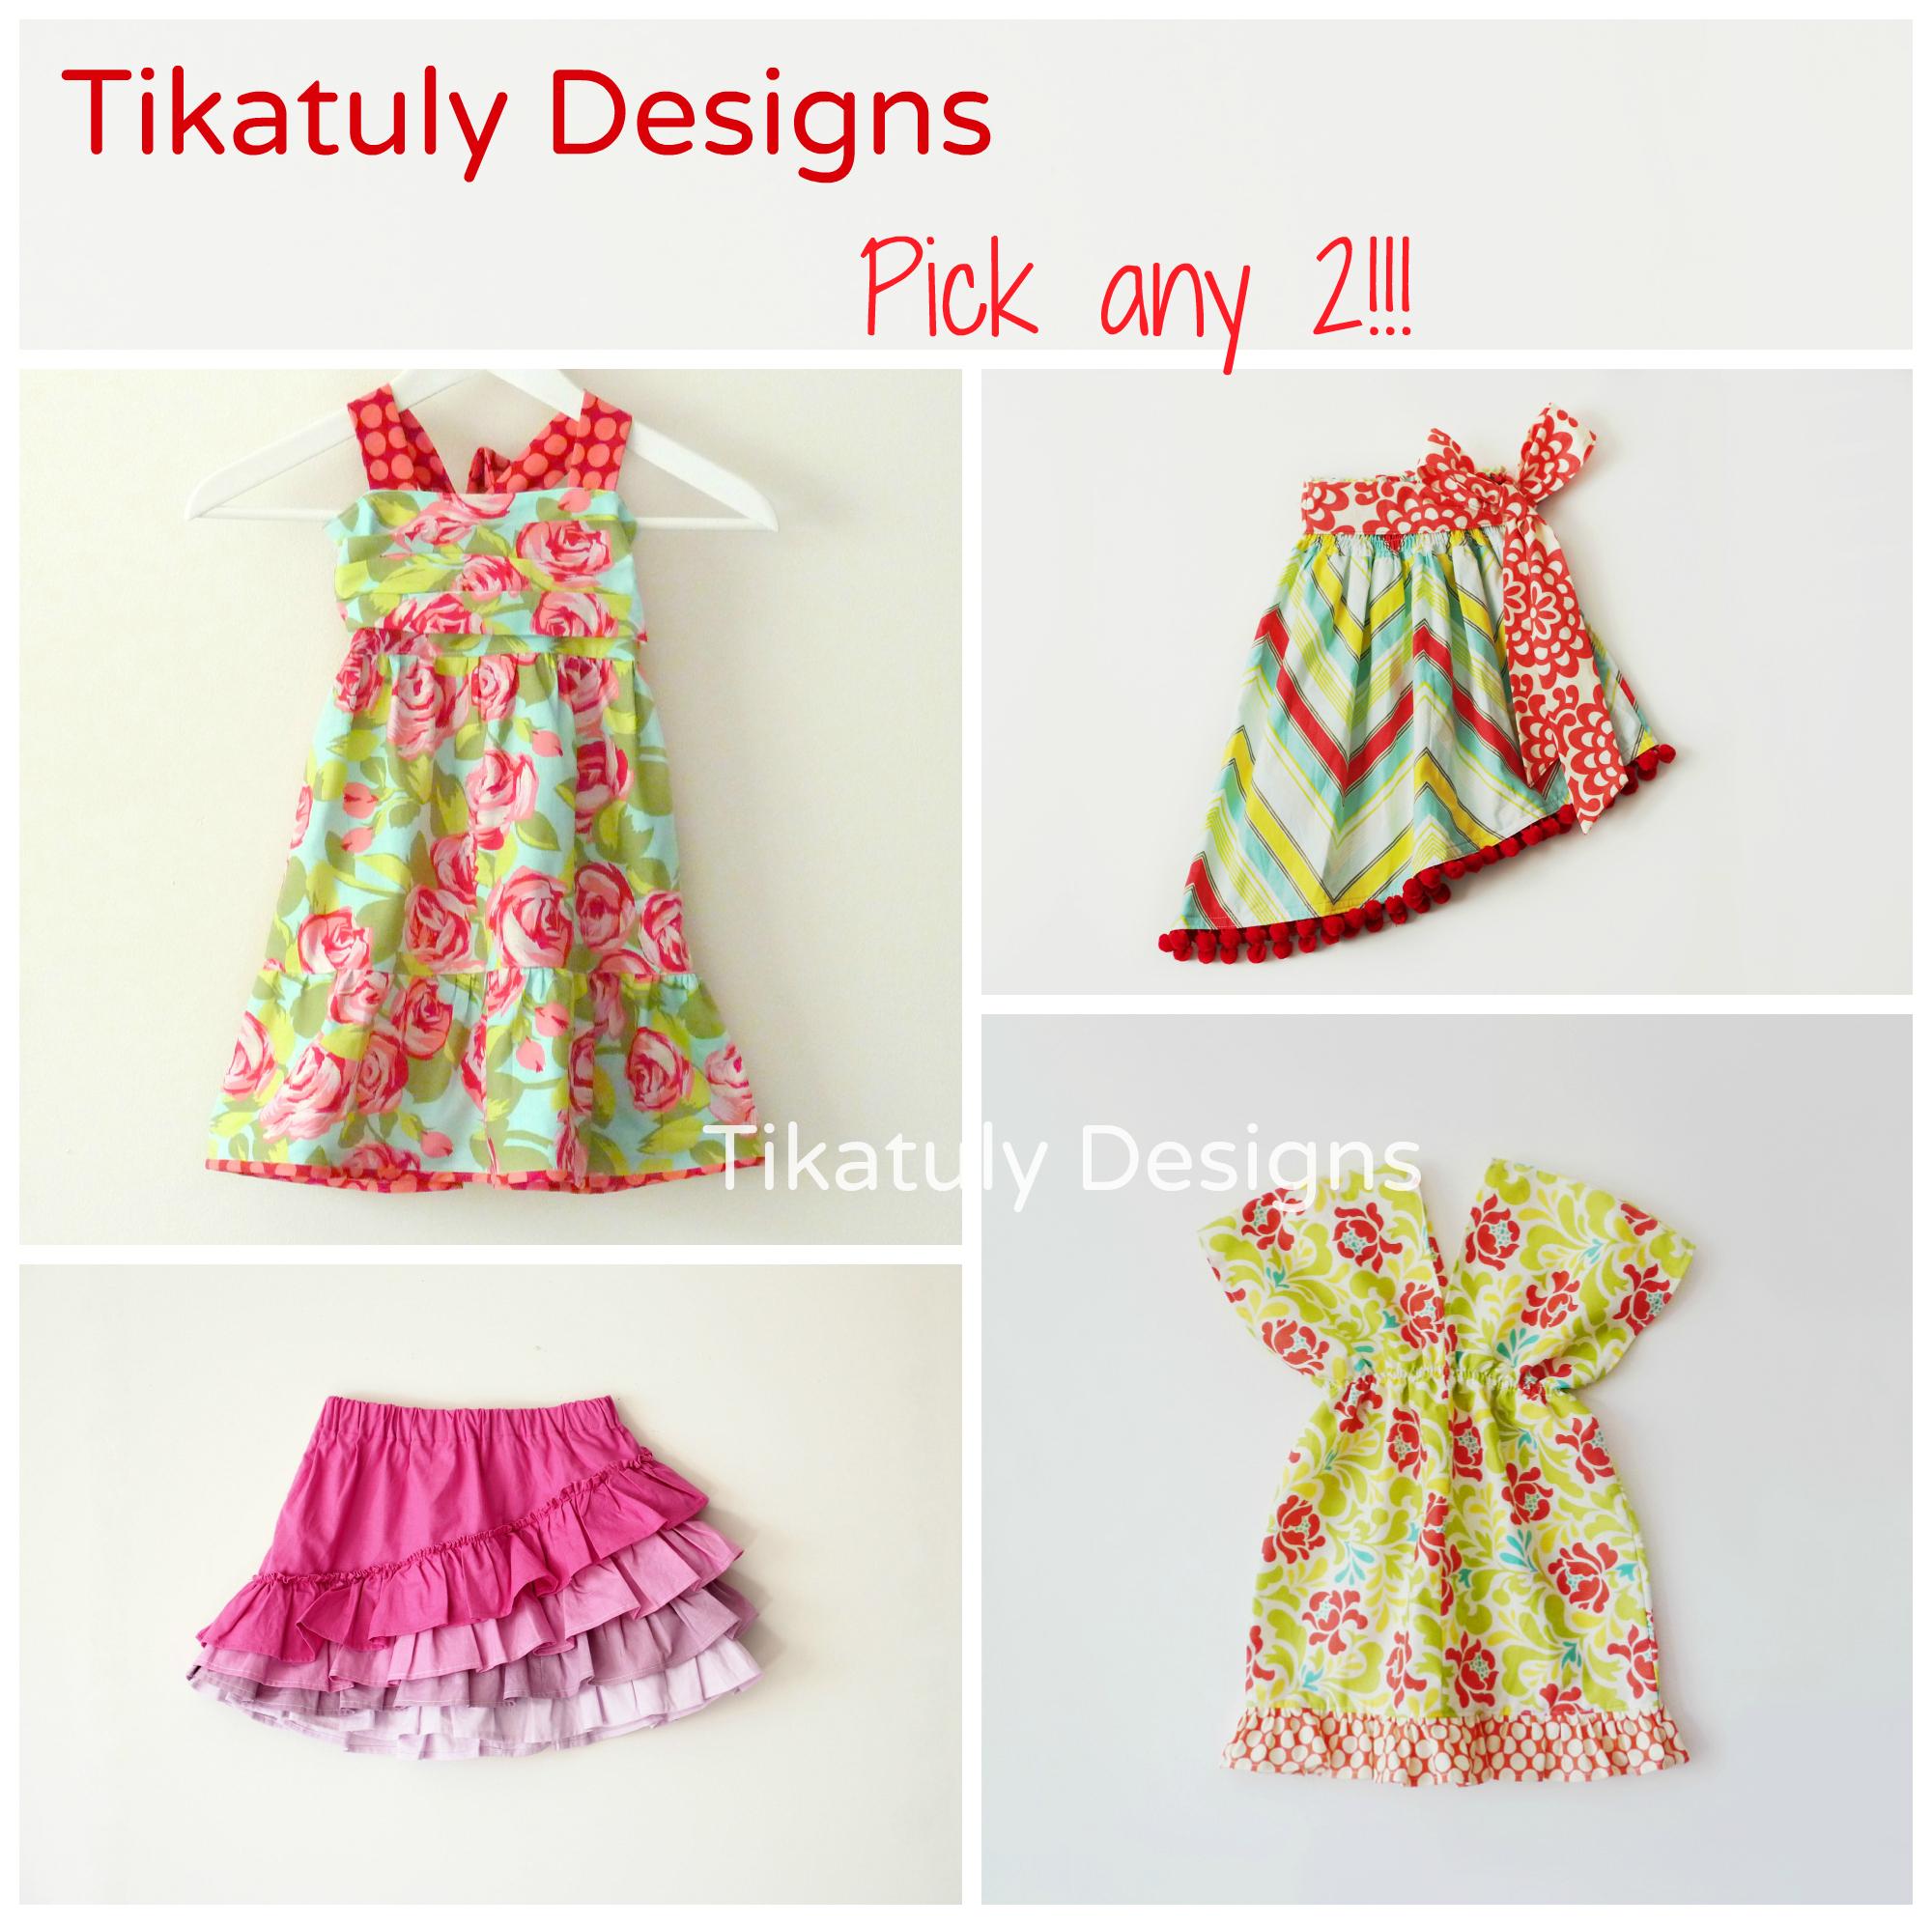 Tikatuly Designs